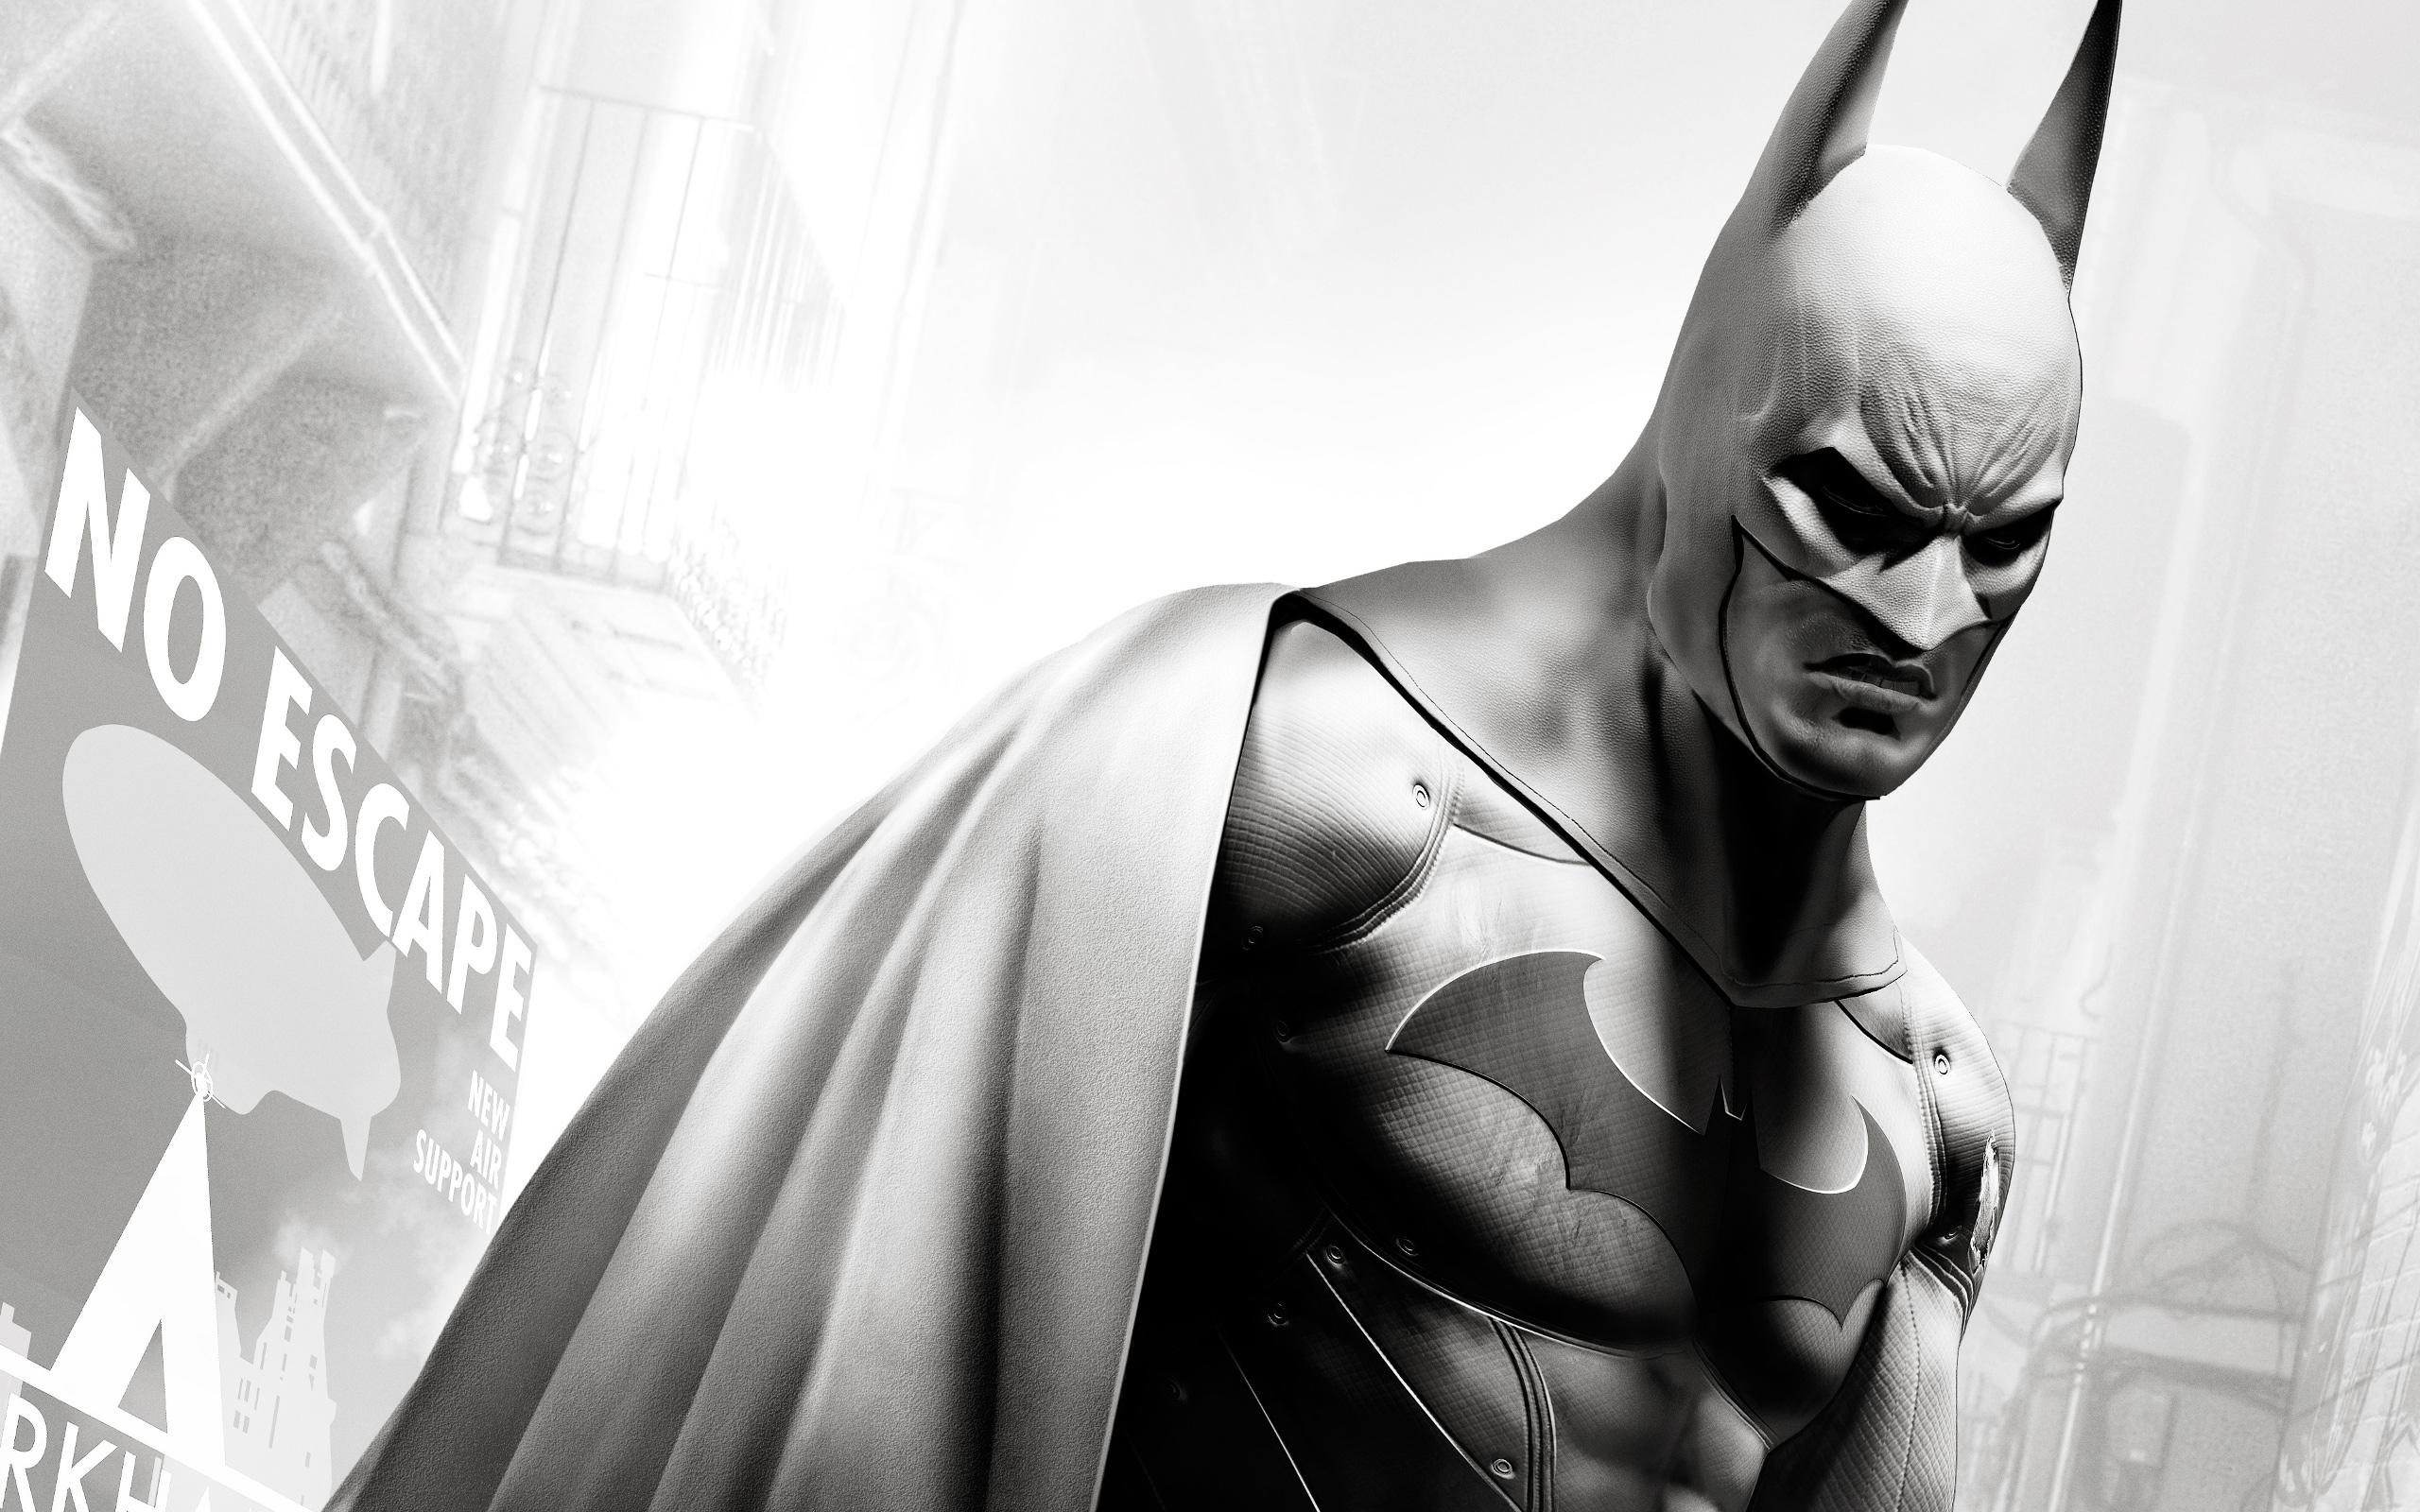 Batman Arkham City Computer Wallpapers Desktop Backgrounds 2560x1600